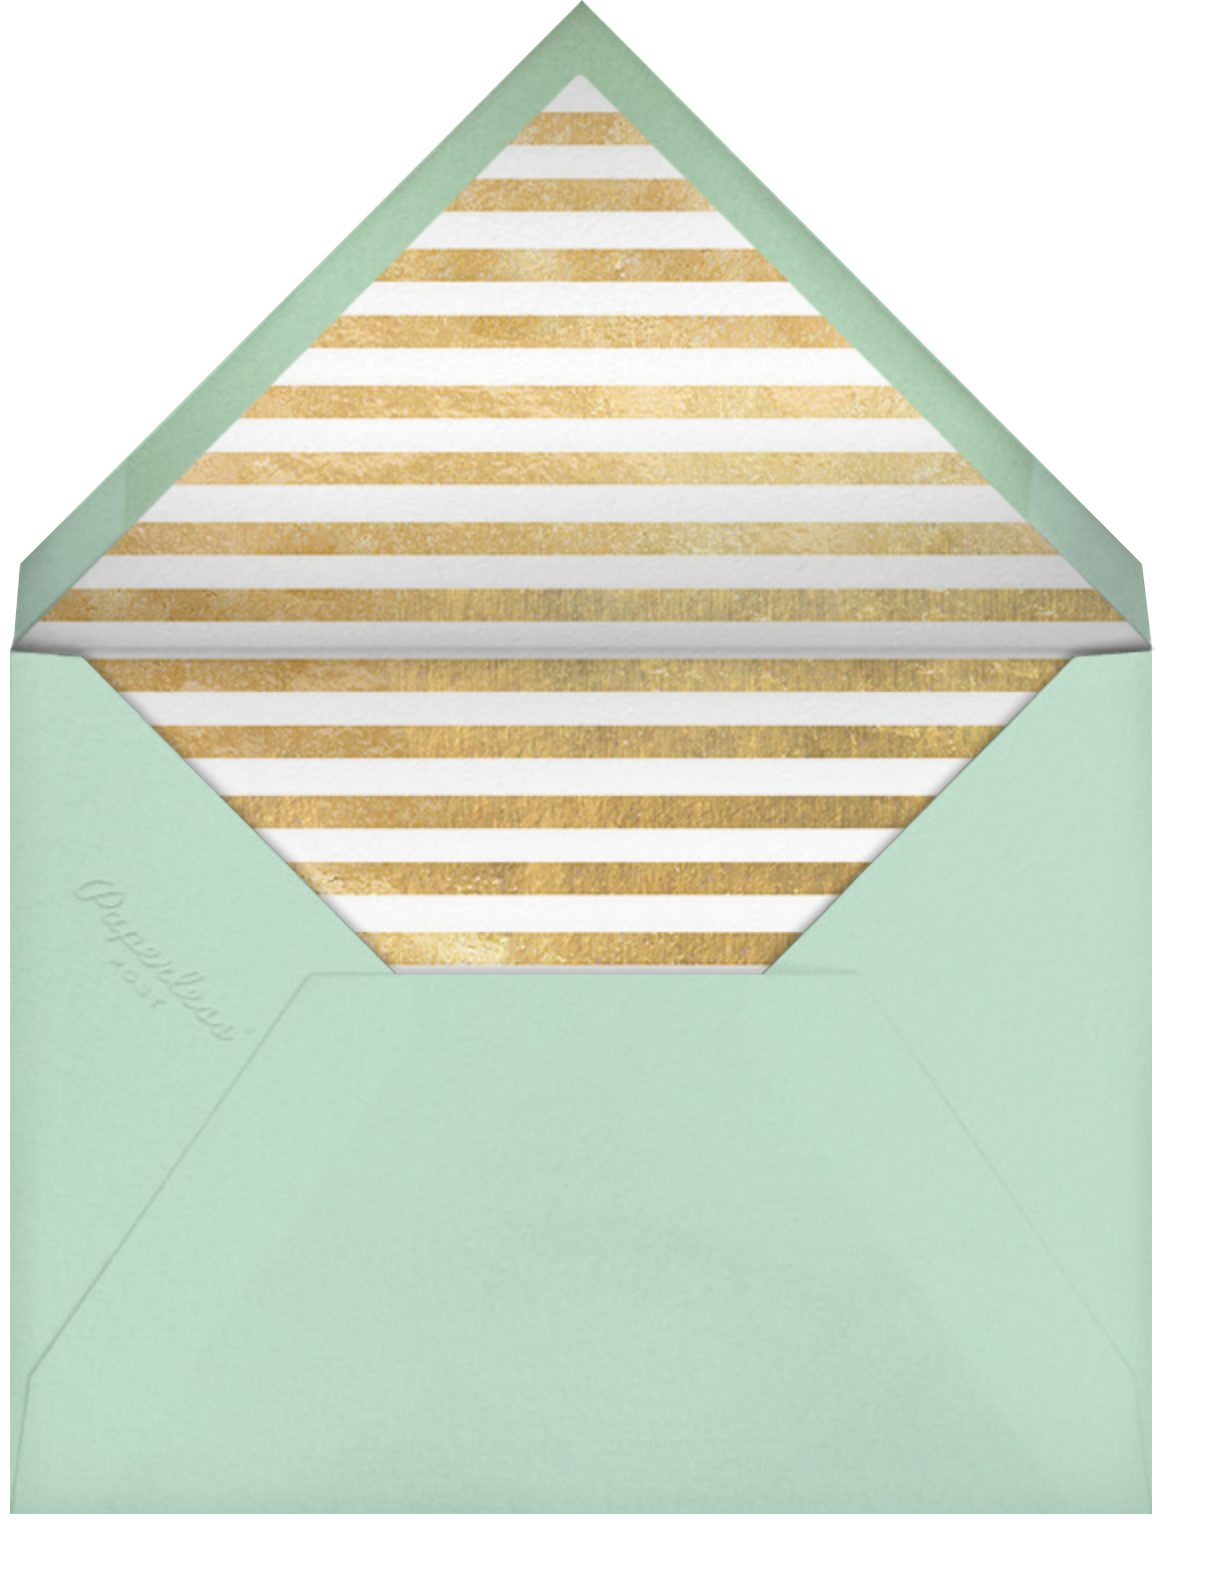 Decade Photo (Seventy) - Gold - Paperless Post - Adult birthday - envelope back